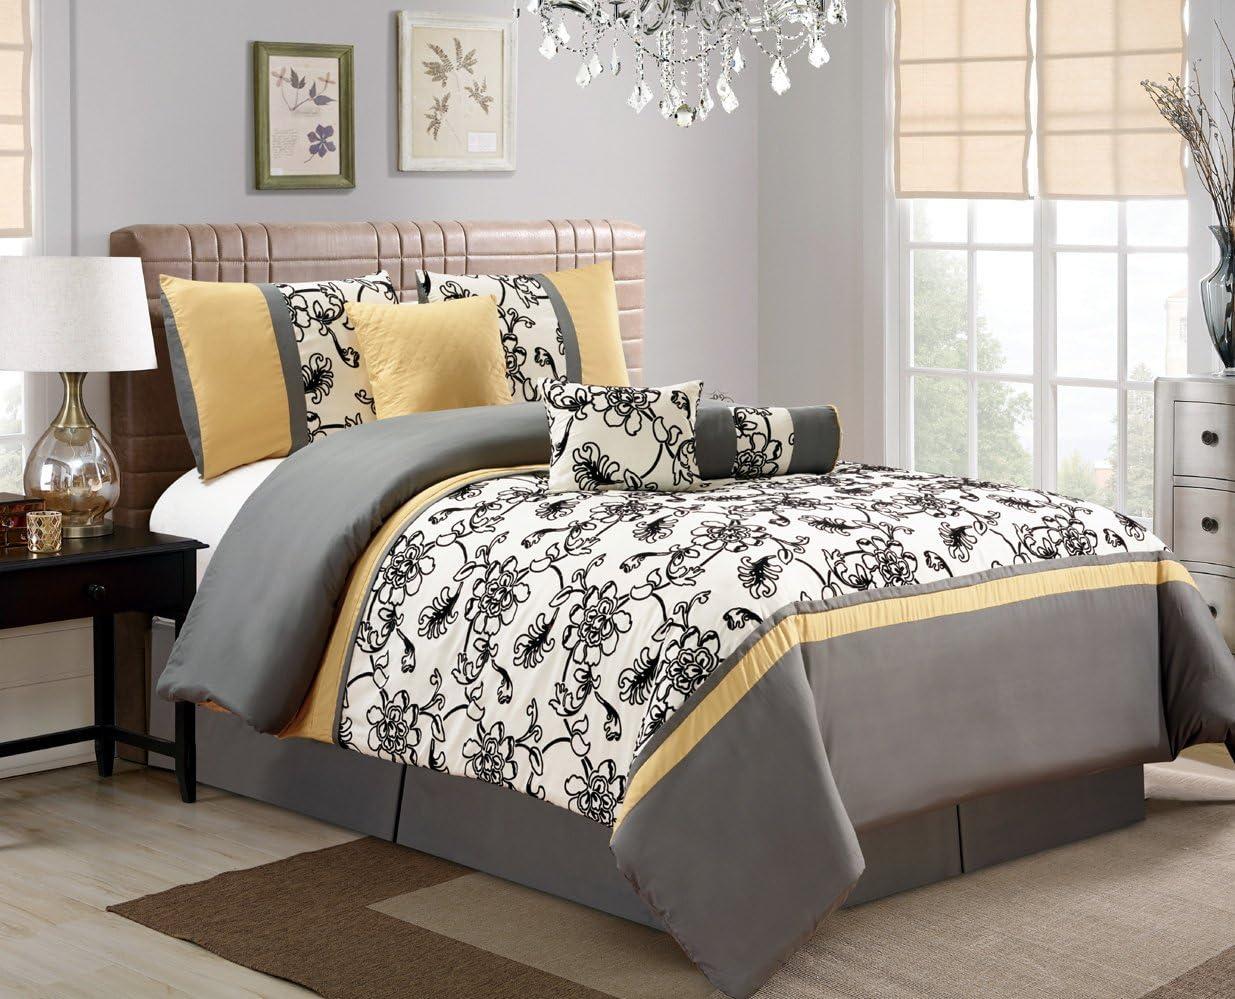 Amazon Com Grand Linen 7 Piece Modern Oversize Yellow Black White Grey Floral Comforter Set Full Size Bedding Home Kitchen